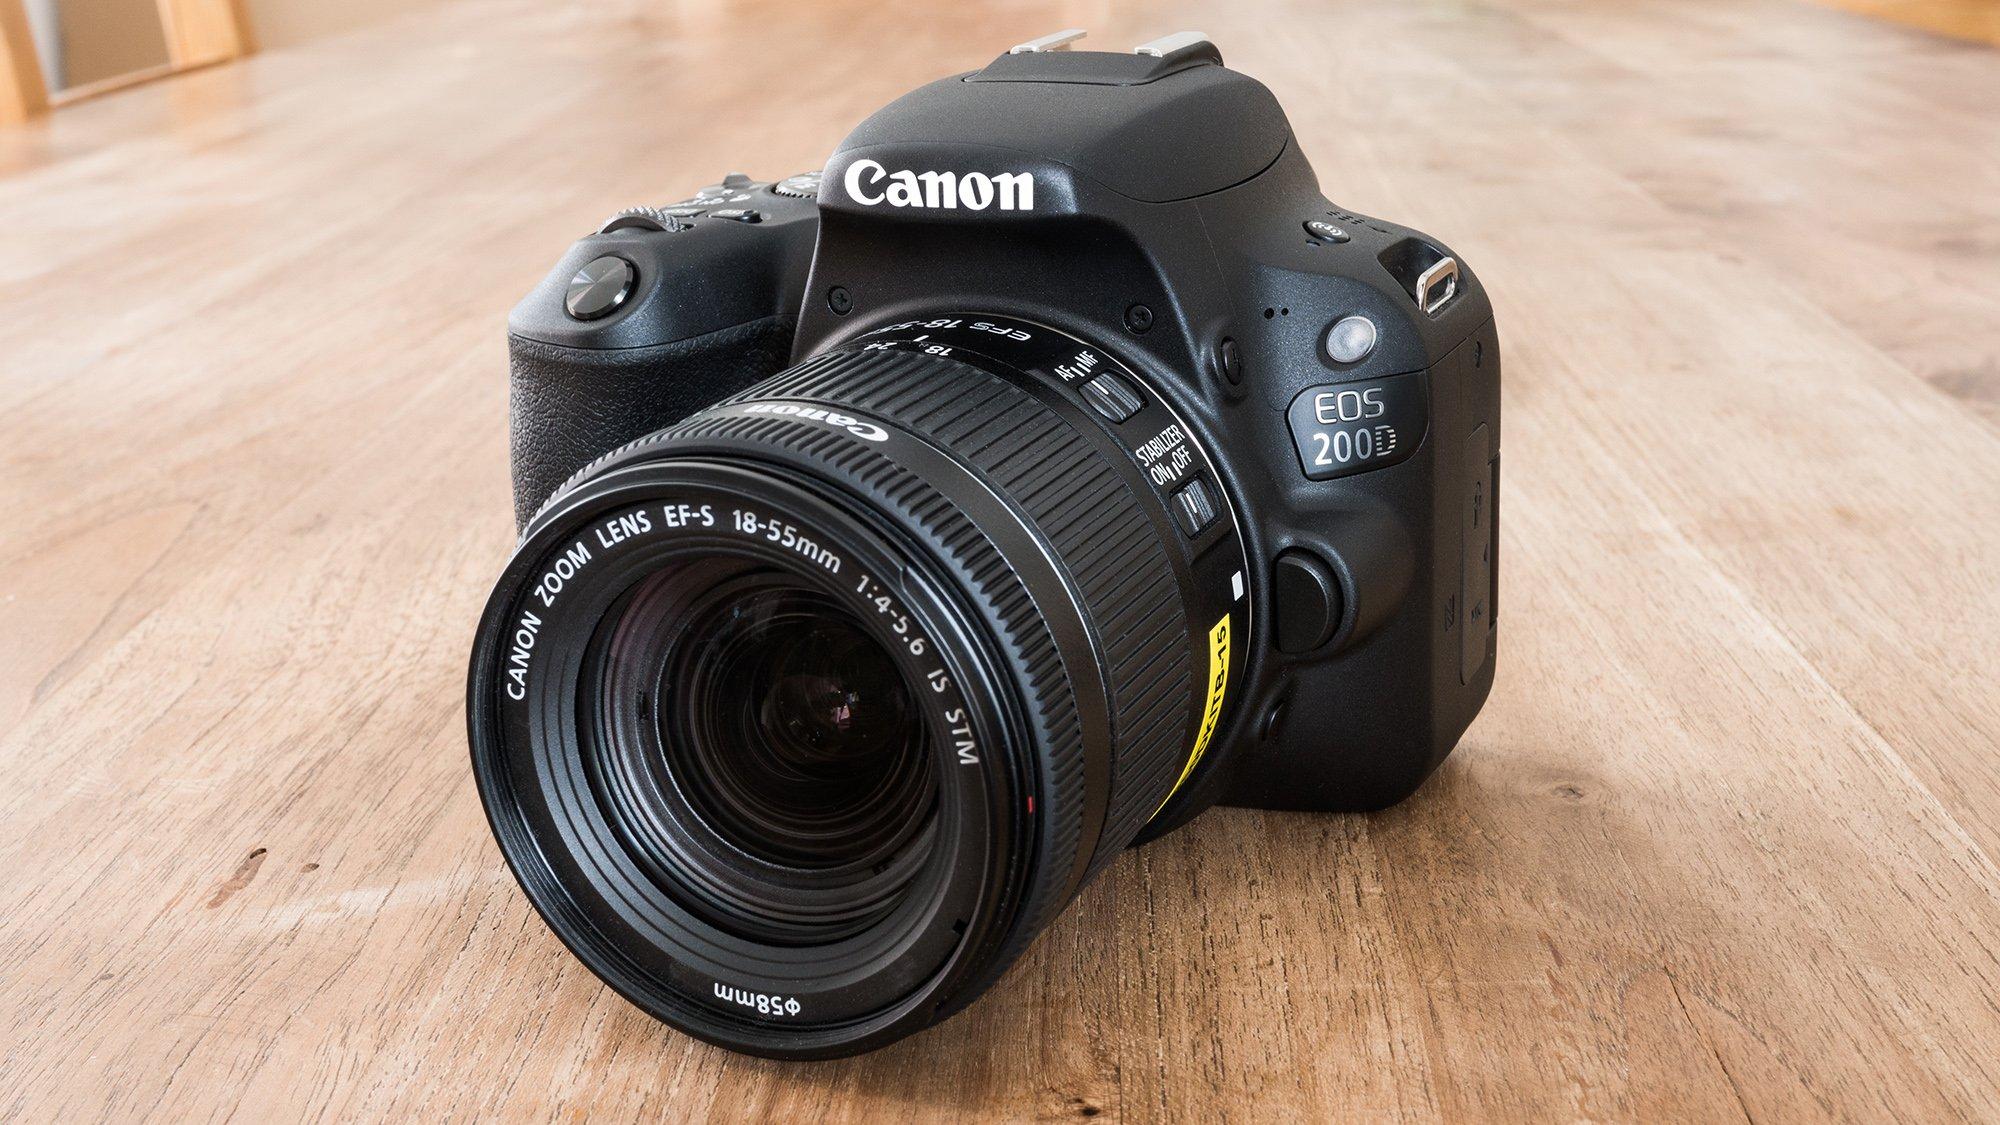 Canon Eos 200d Review A Solid Budget Dslr Expert Reviews